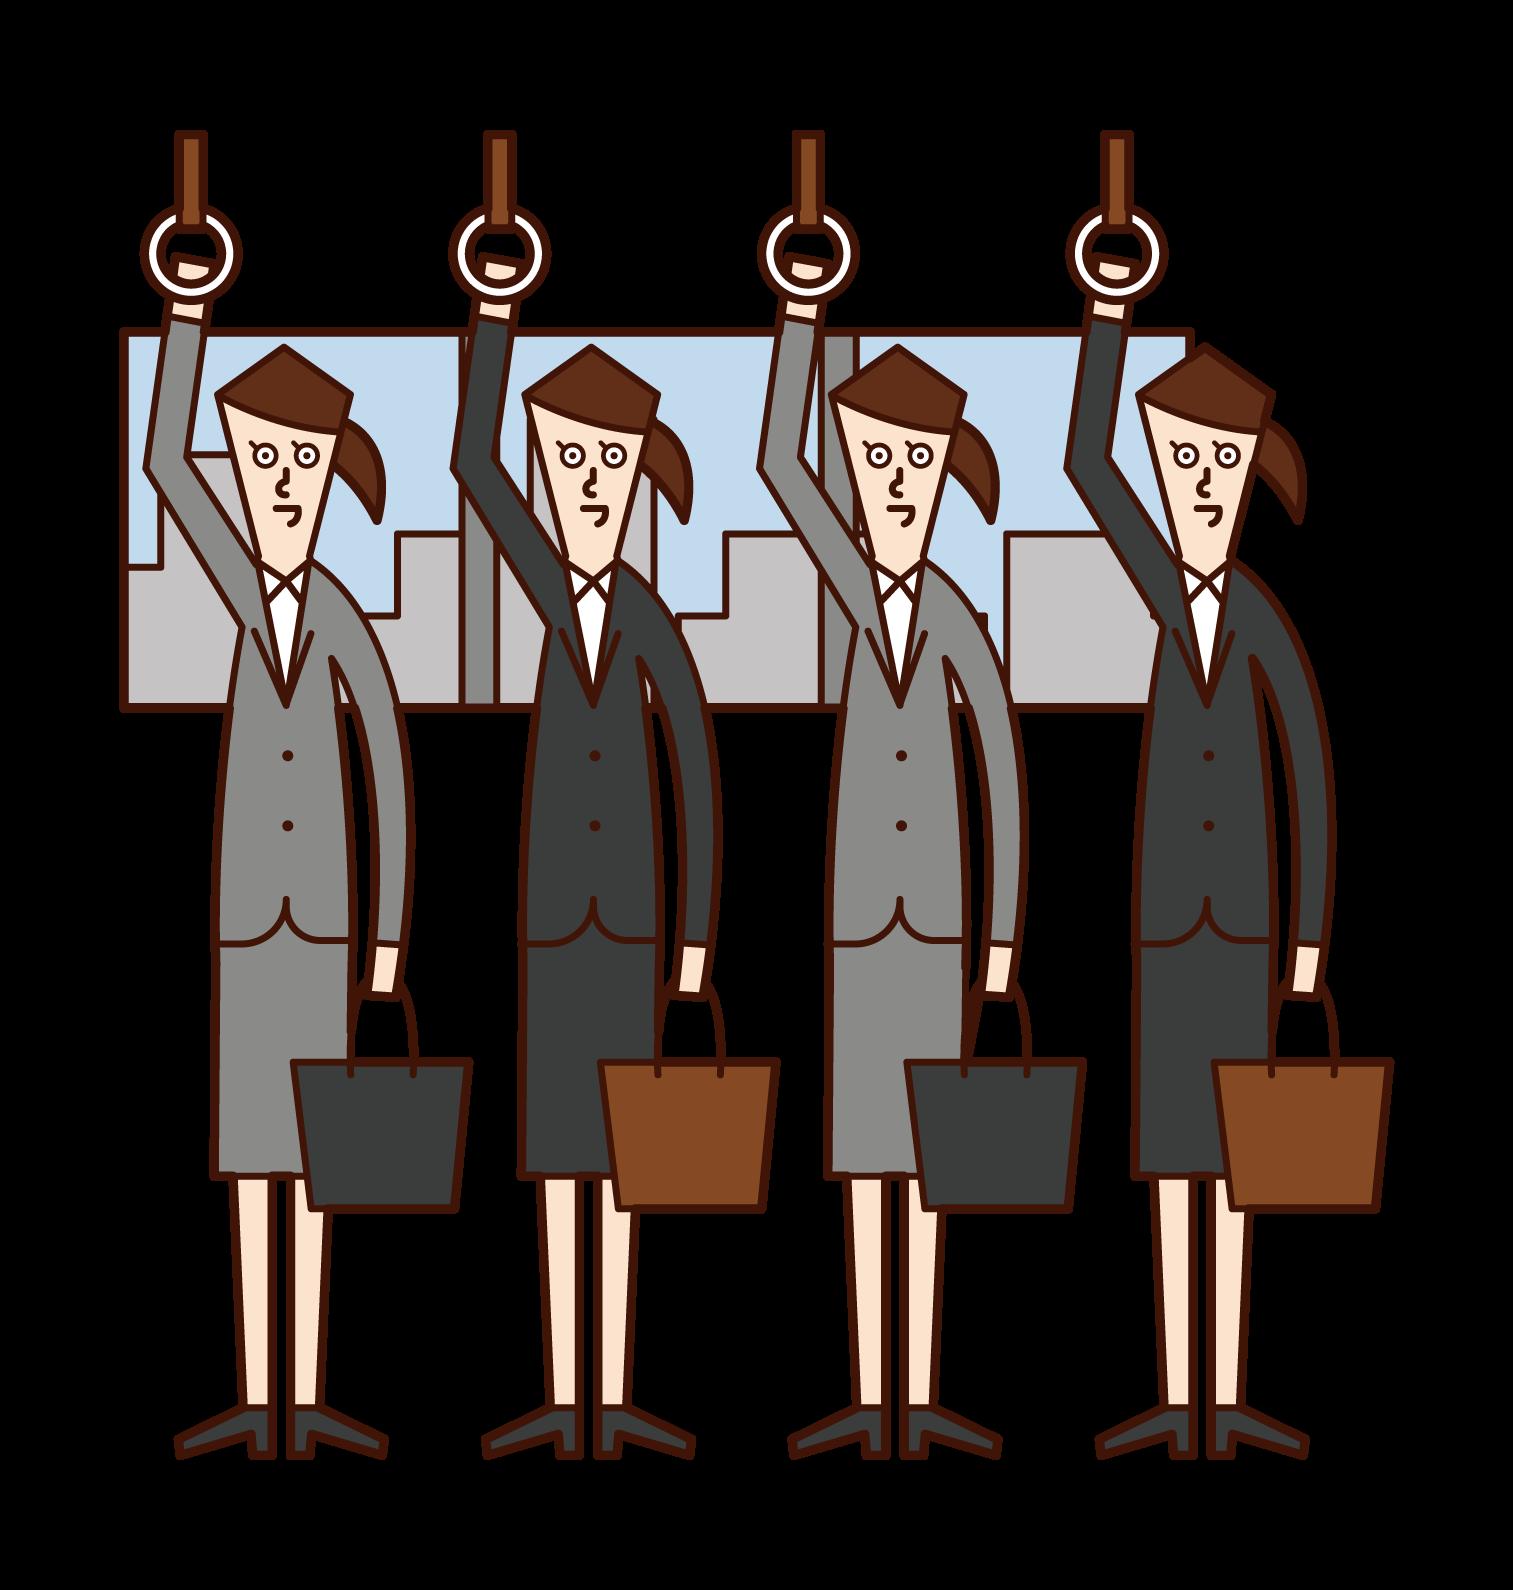 Illustration of people (women) on a commuter train